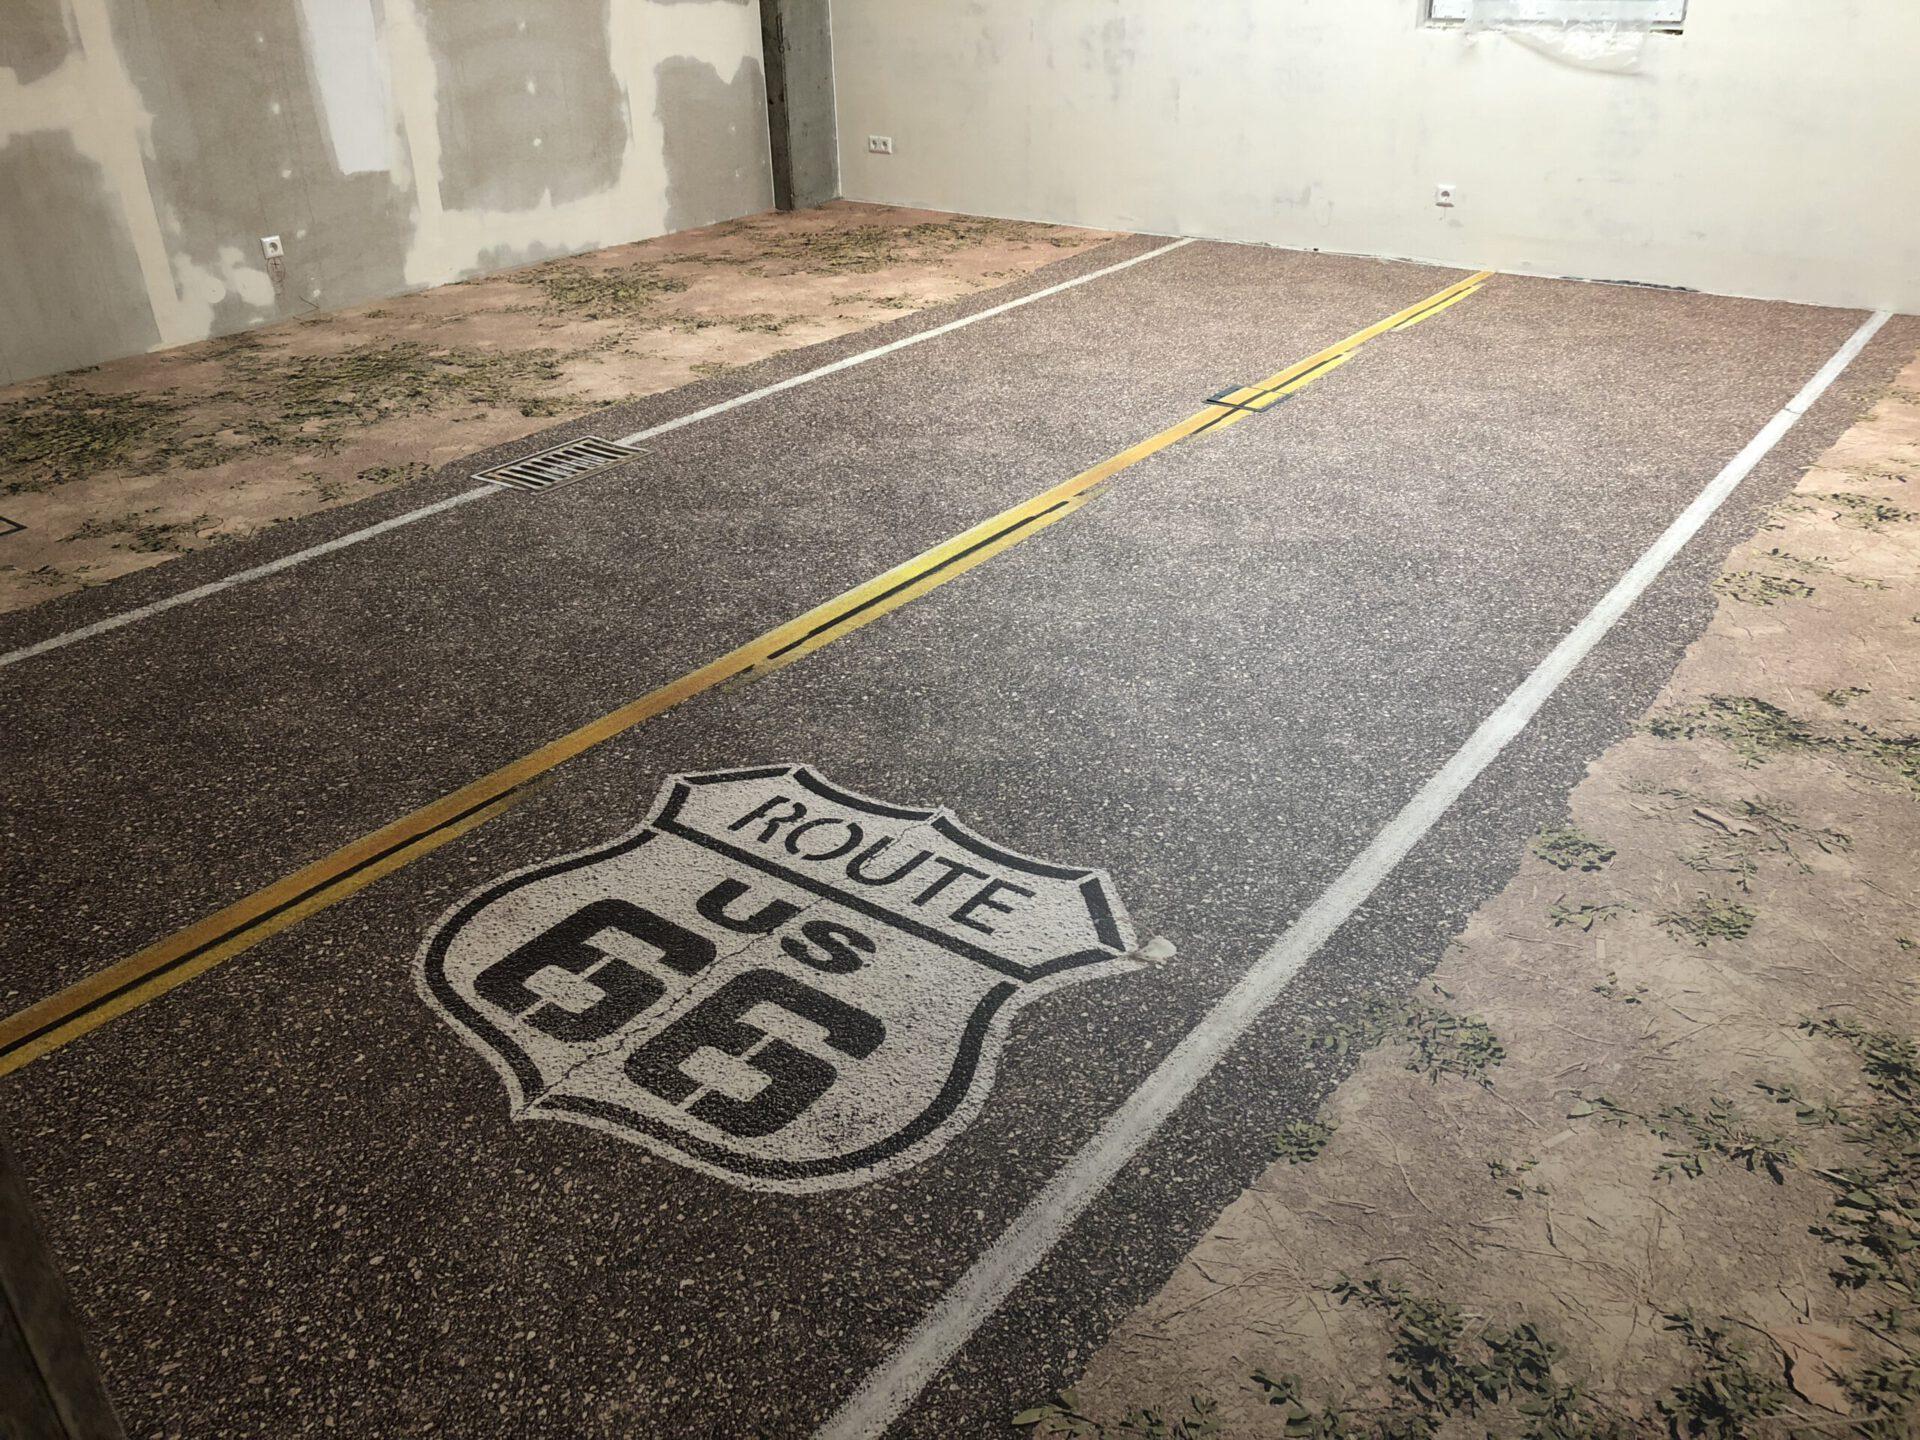 nimble_asset_Fotoboden-Route-66-scaled